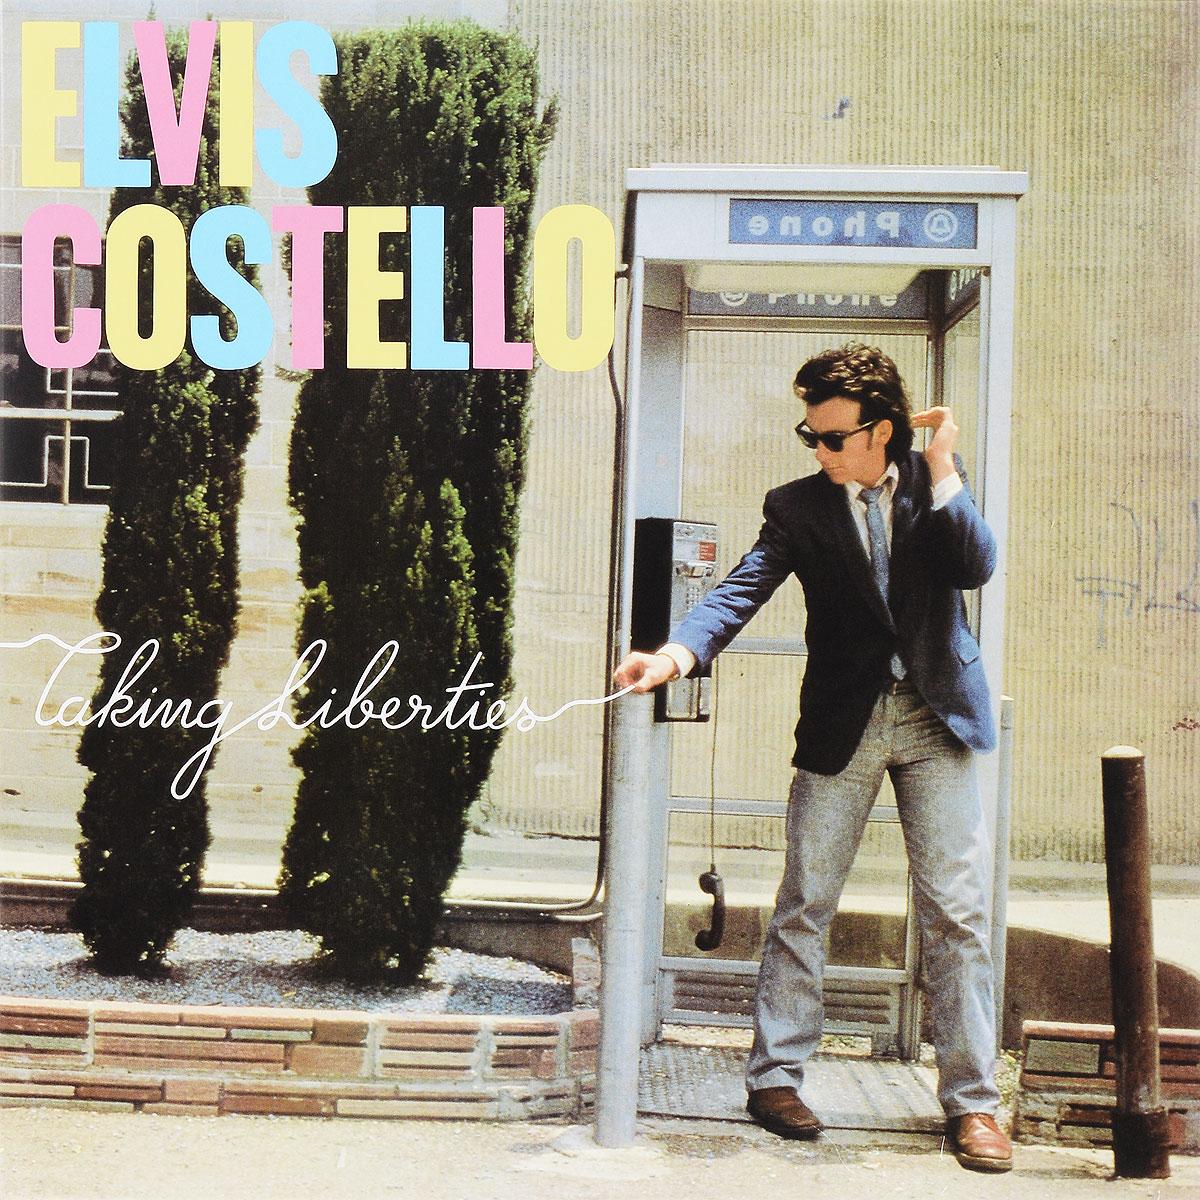 Elvis Costello. Taking Liberties (LP) коллекционная футбольная карточка томас мюллер германия